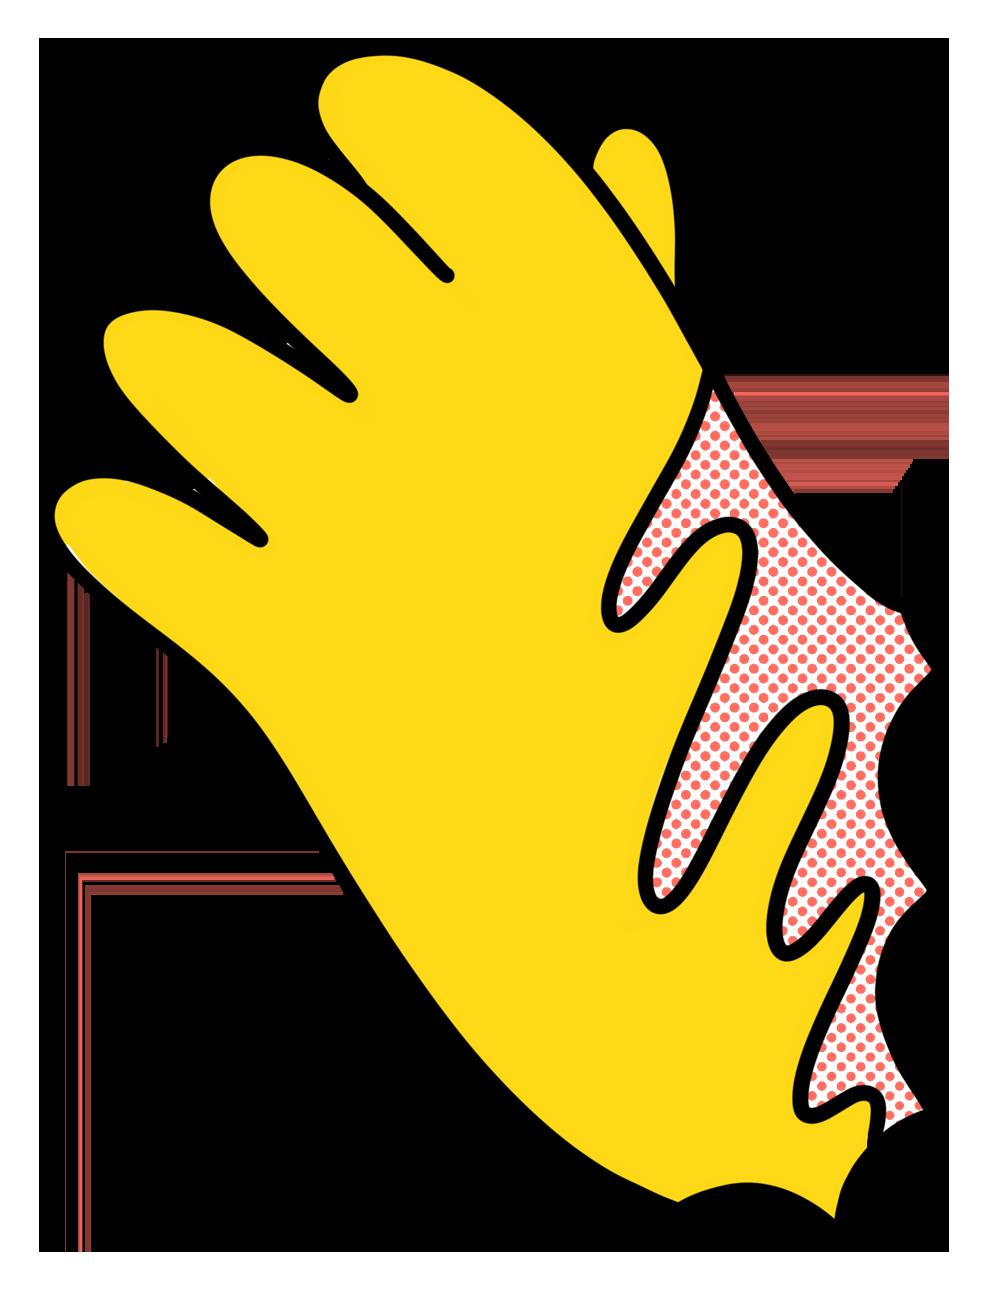 Geo Law illustrated cartoon hand